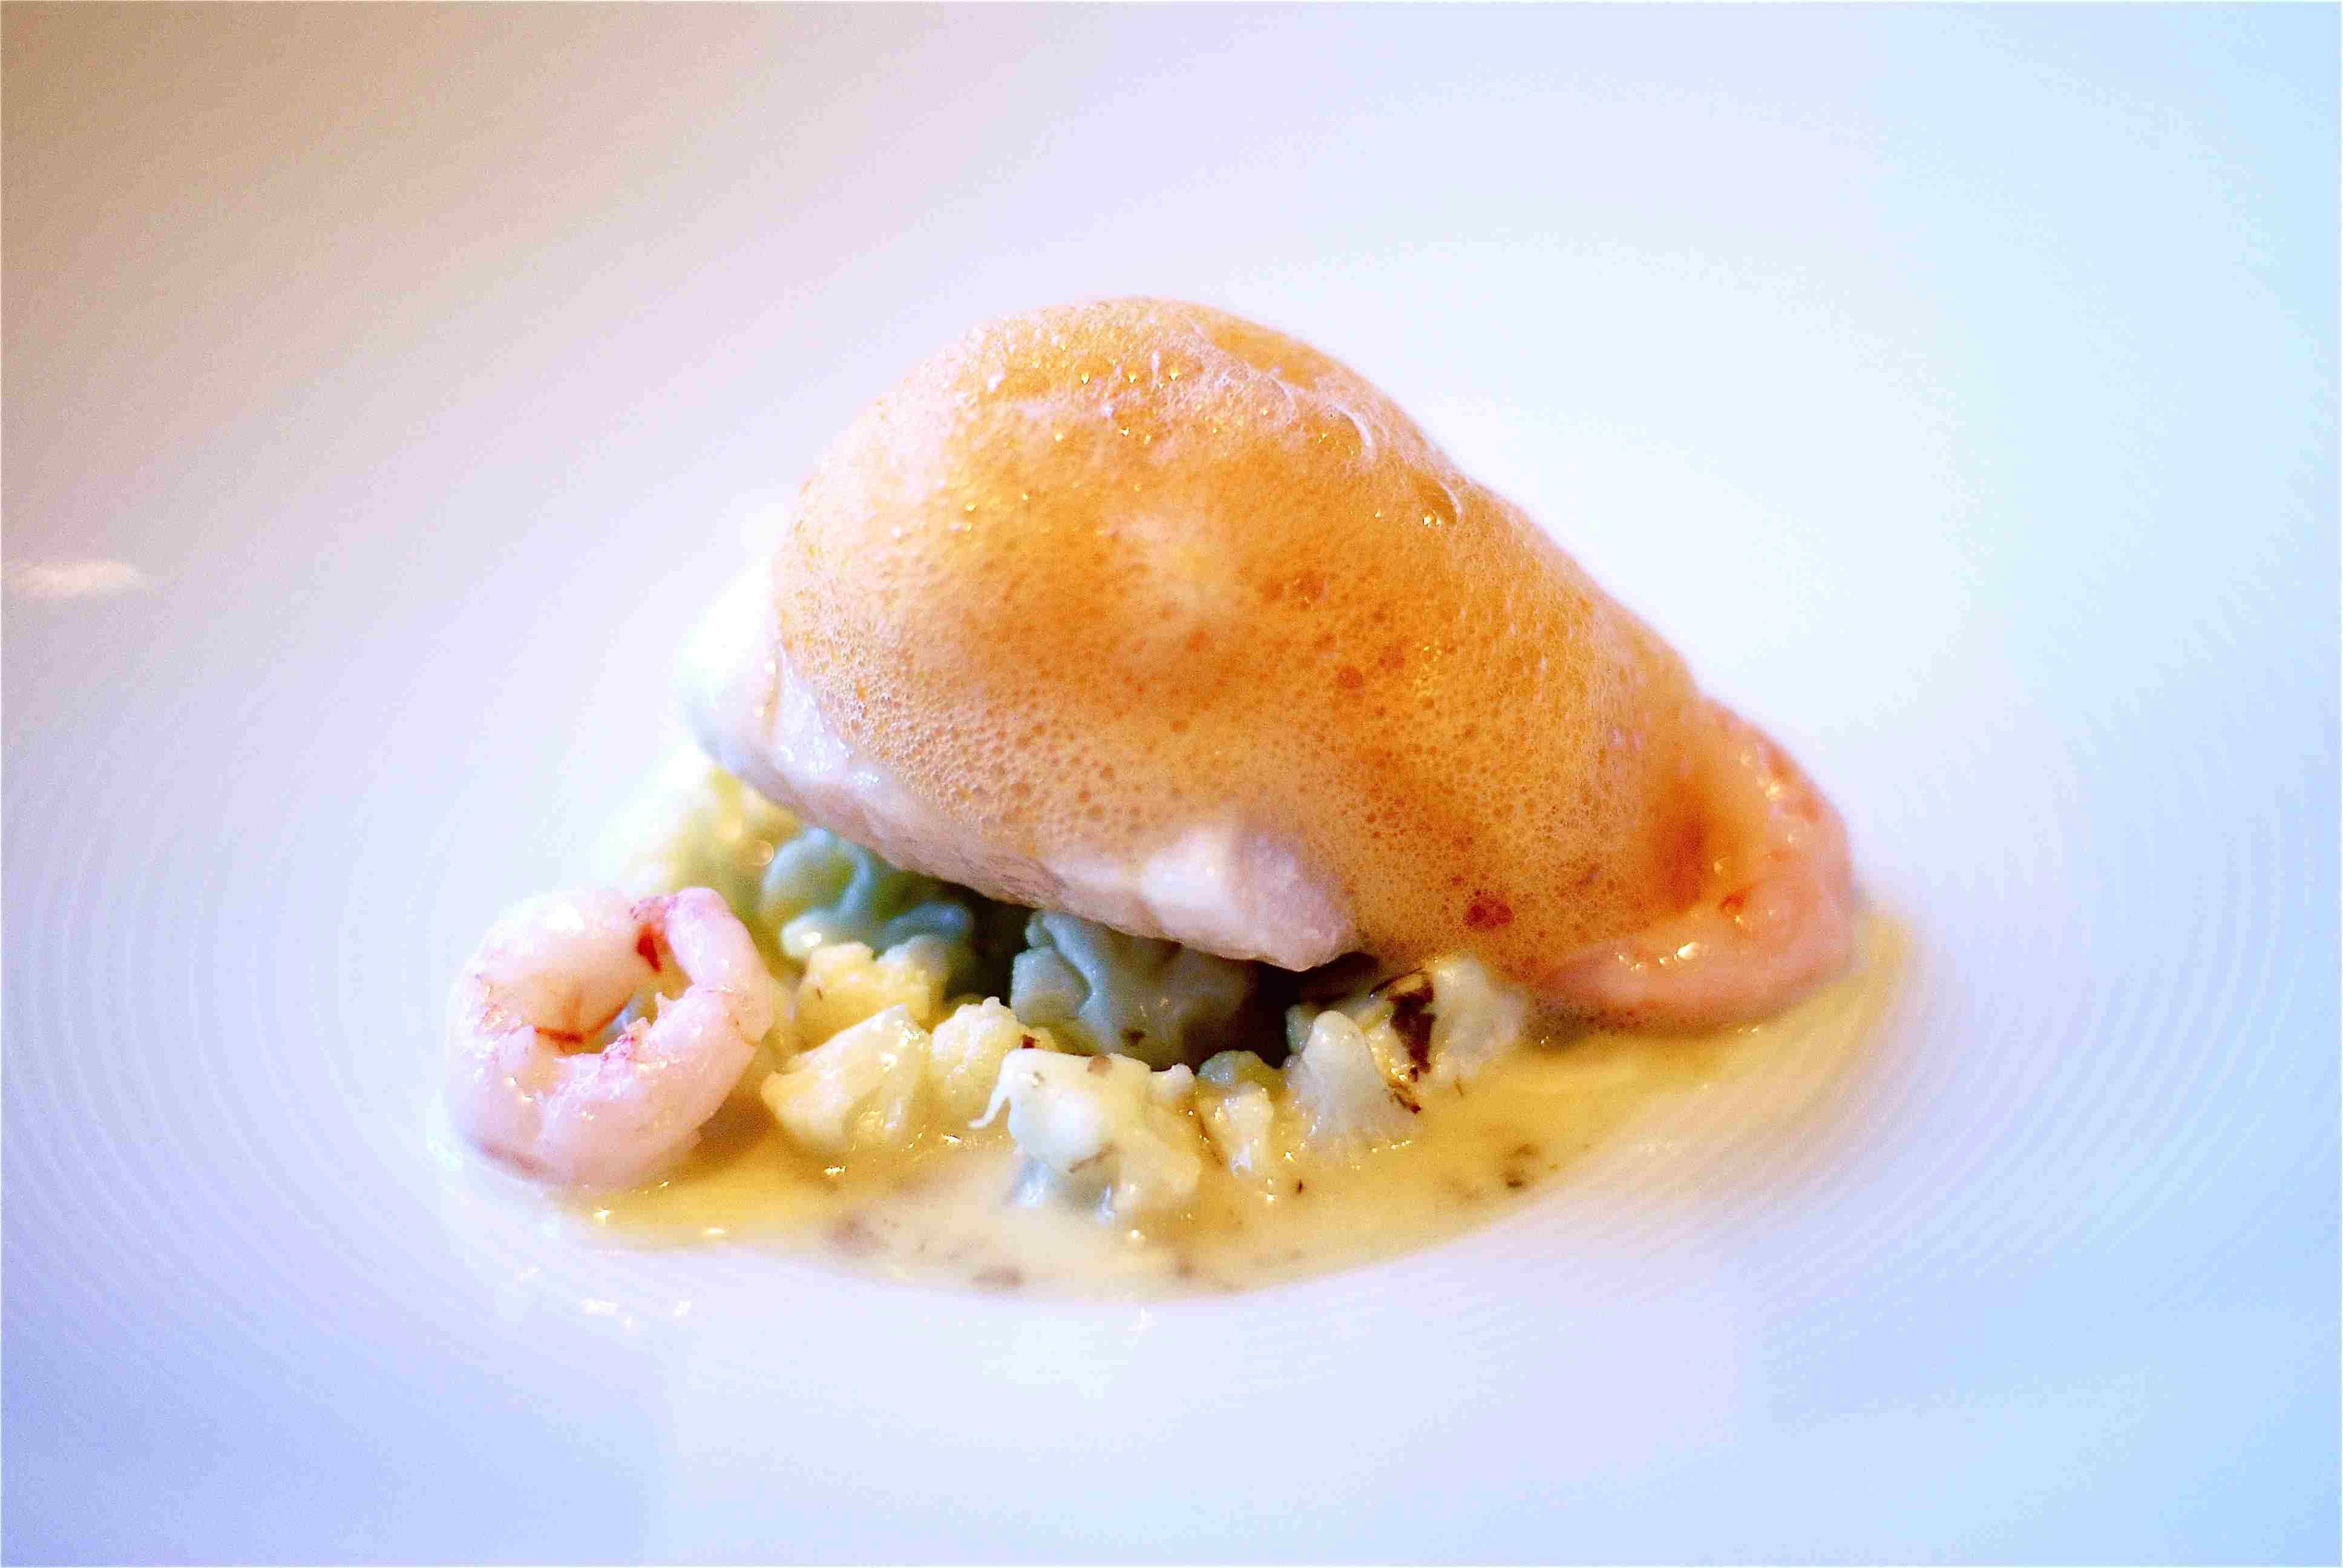 Alaskan Black Cod with Cauliflower at Aubergine Restaurant